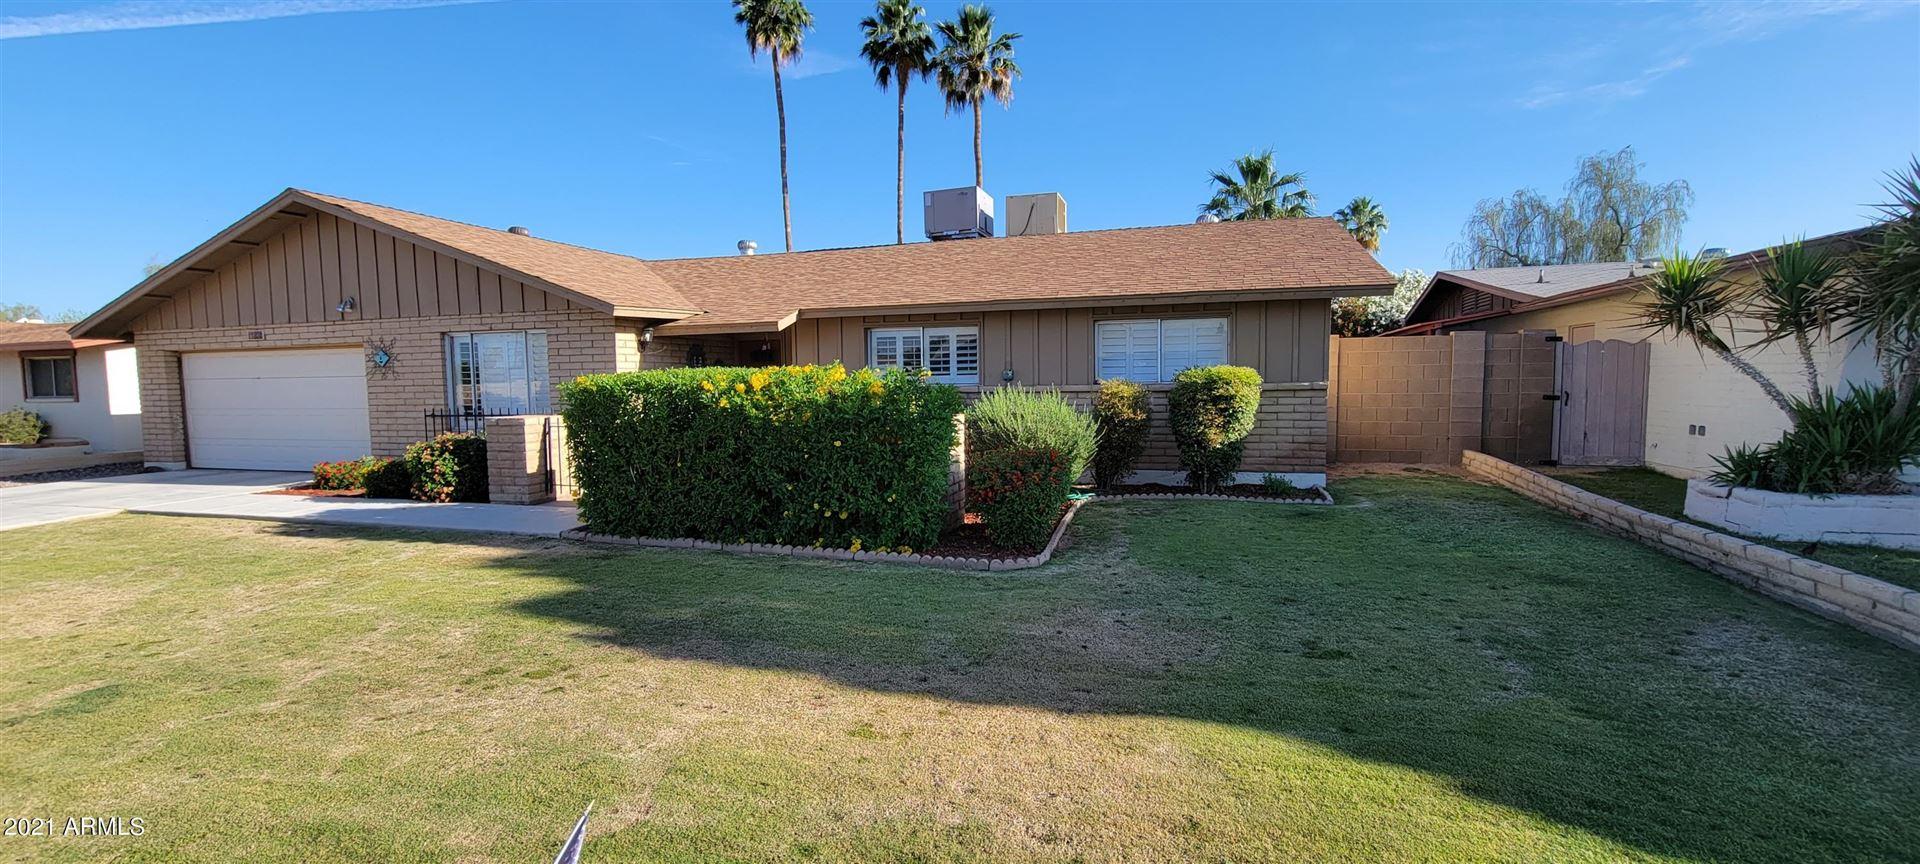 Photo of 1886 E Sesame Street, Tempe, AZ 85283 (MLS # 6223904)